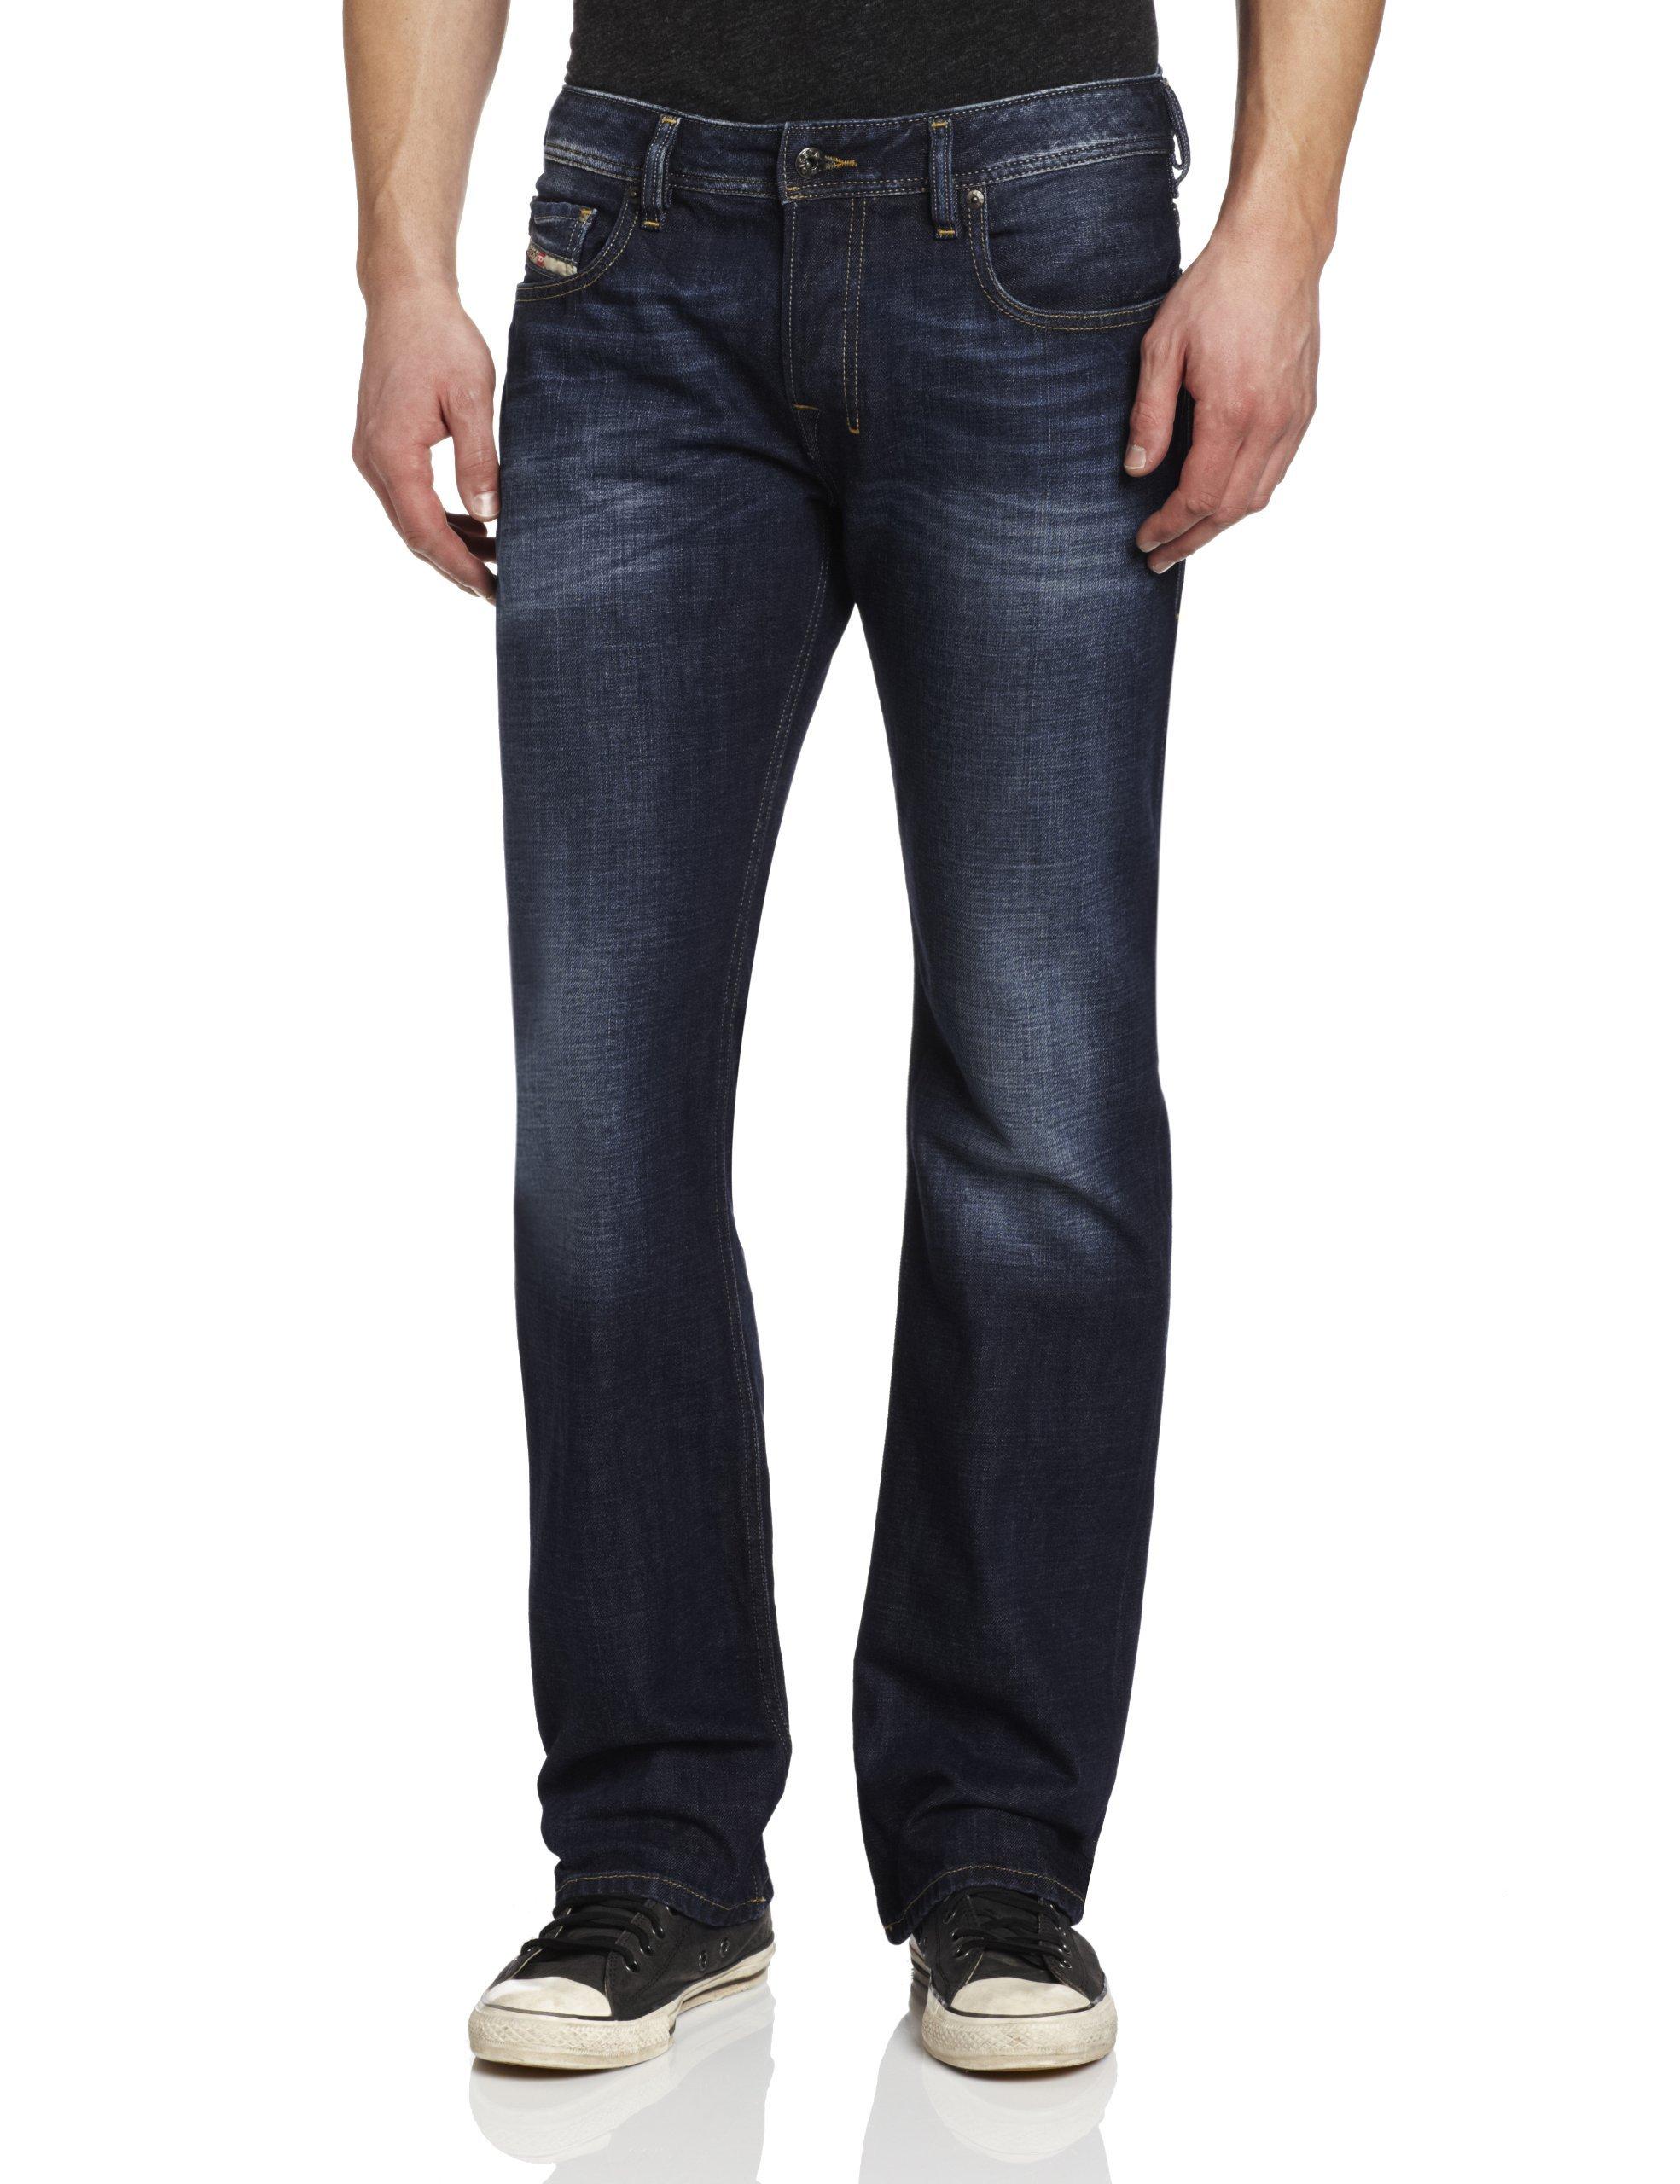 Diesel Men's Zatiny Slim Micro Bootcut Leg Jean 0074W, Denim, 31x32